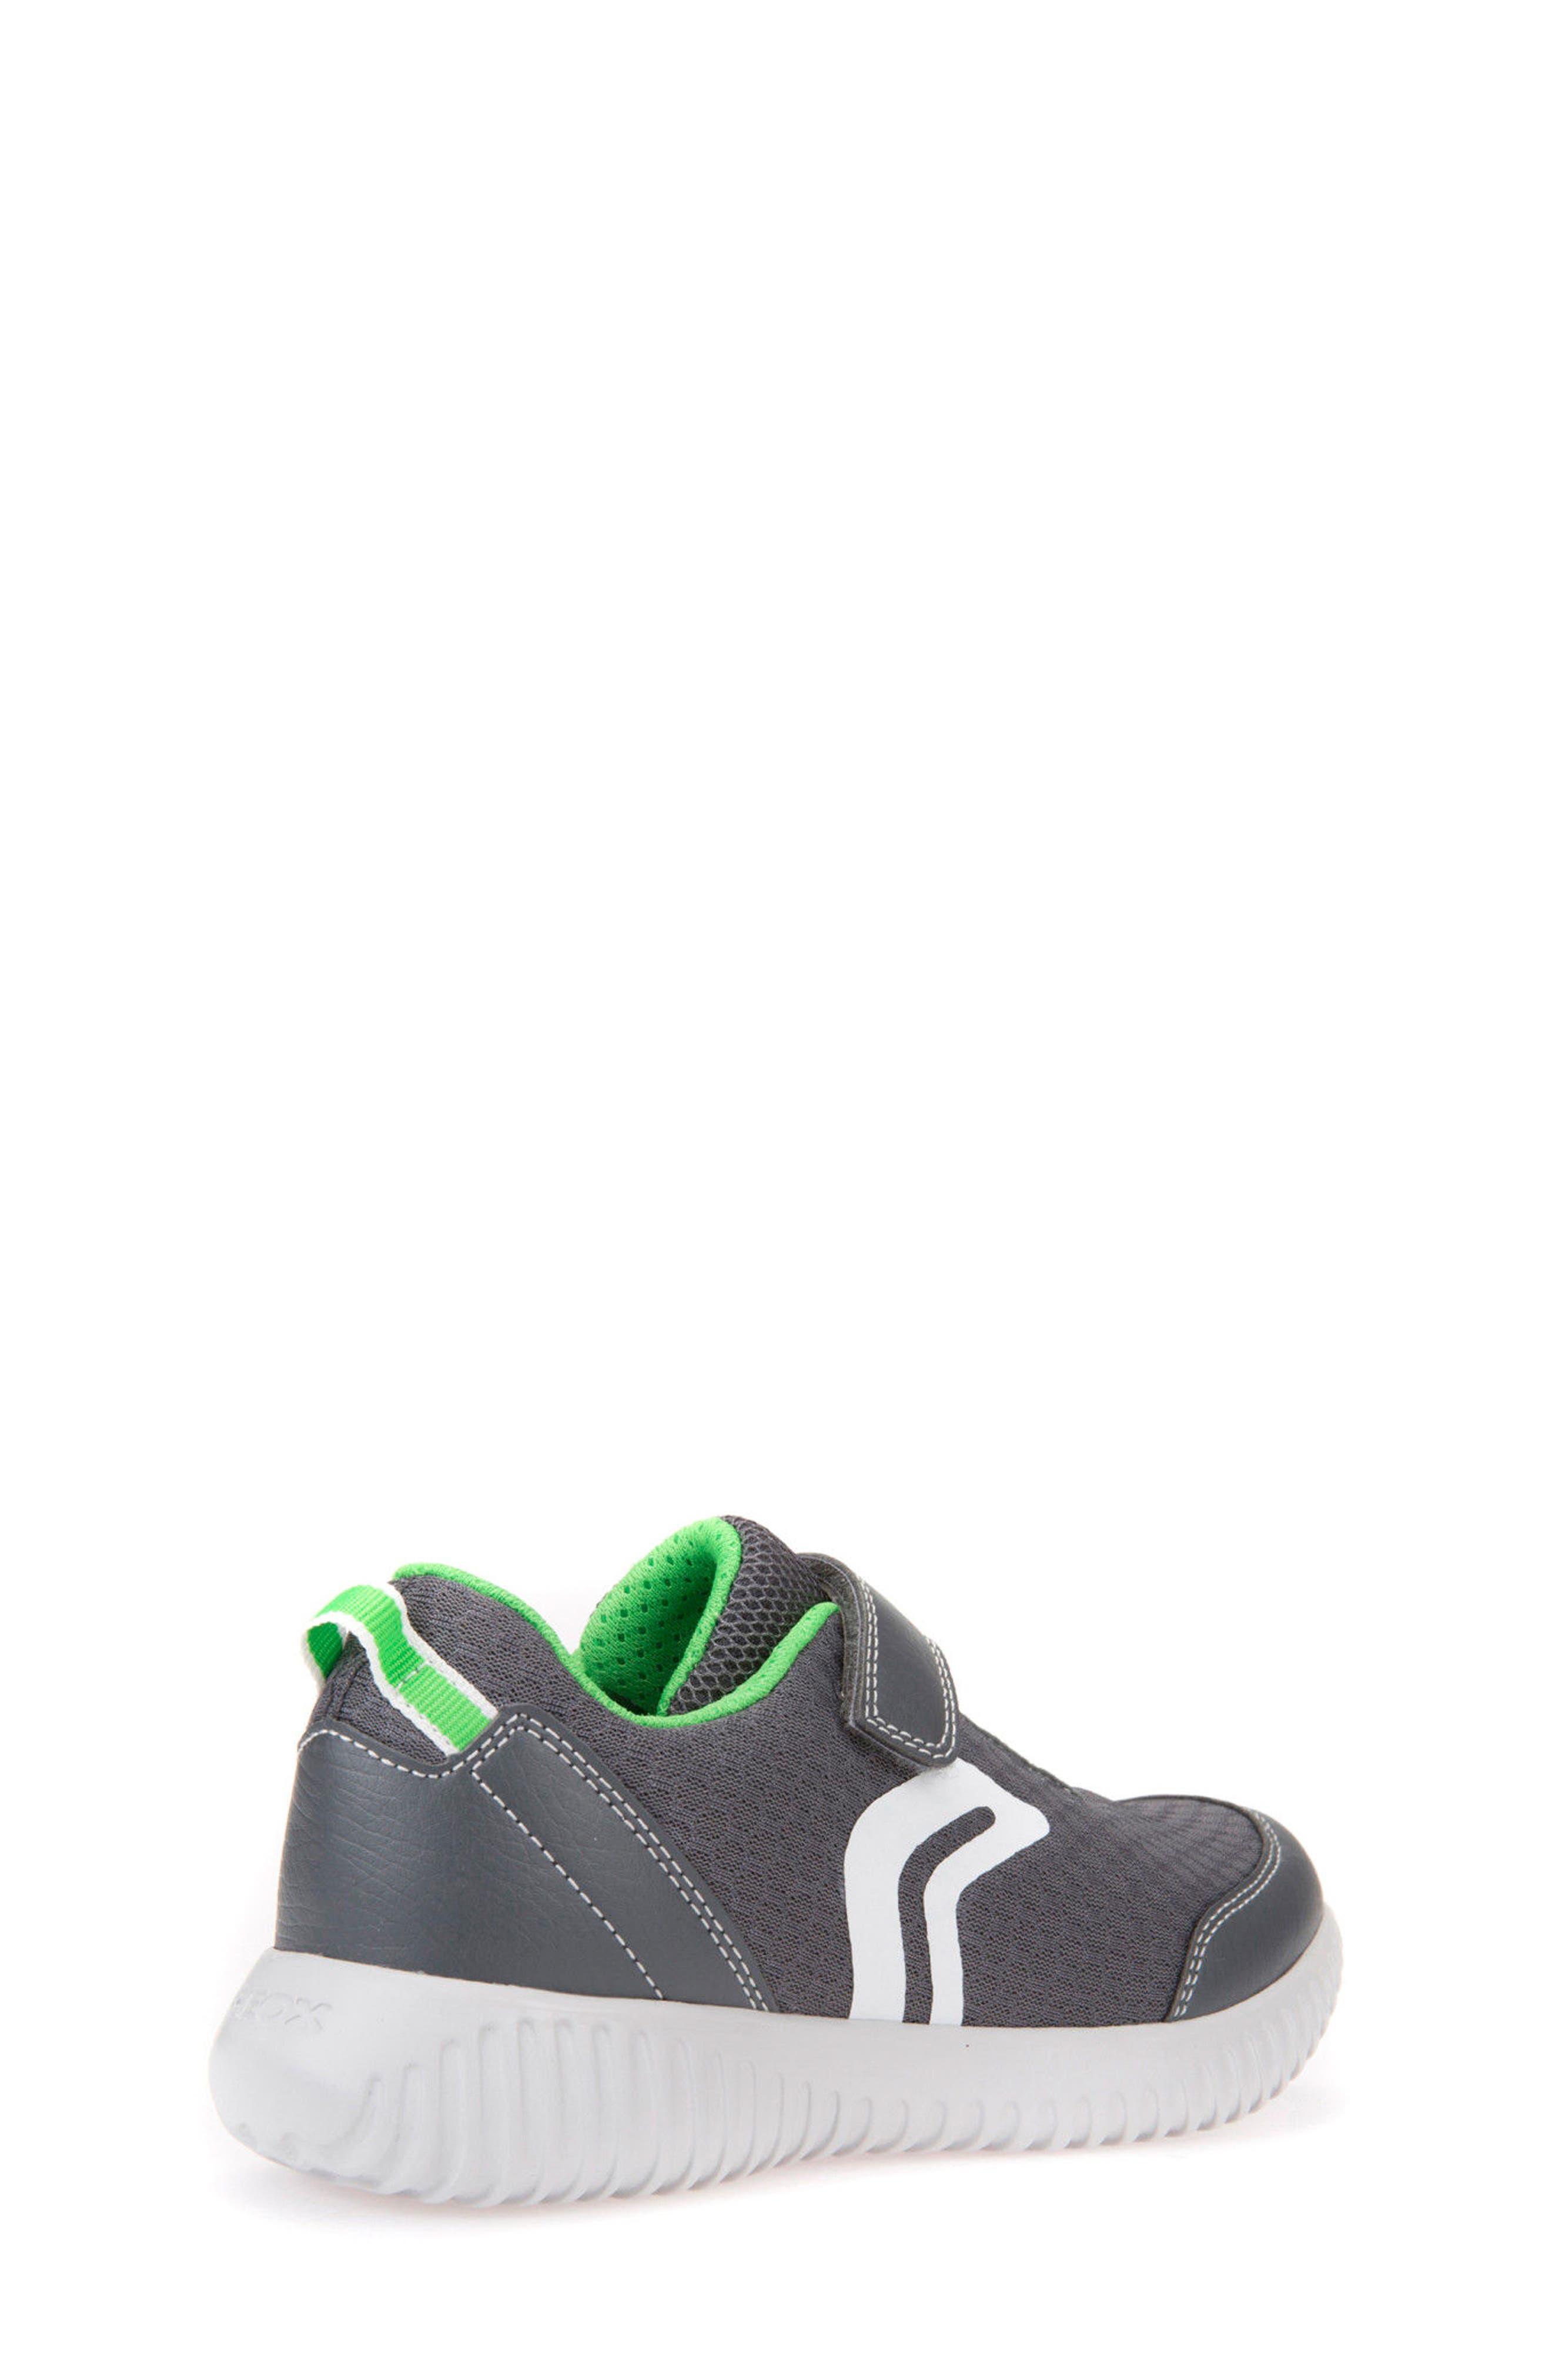 Alternate Image 2  - Geox Waviness Sneaker (Toddler, Little Kid & Big Kid)